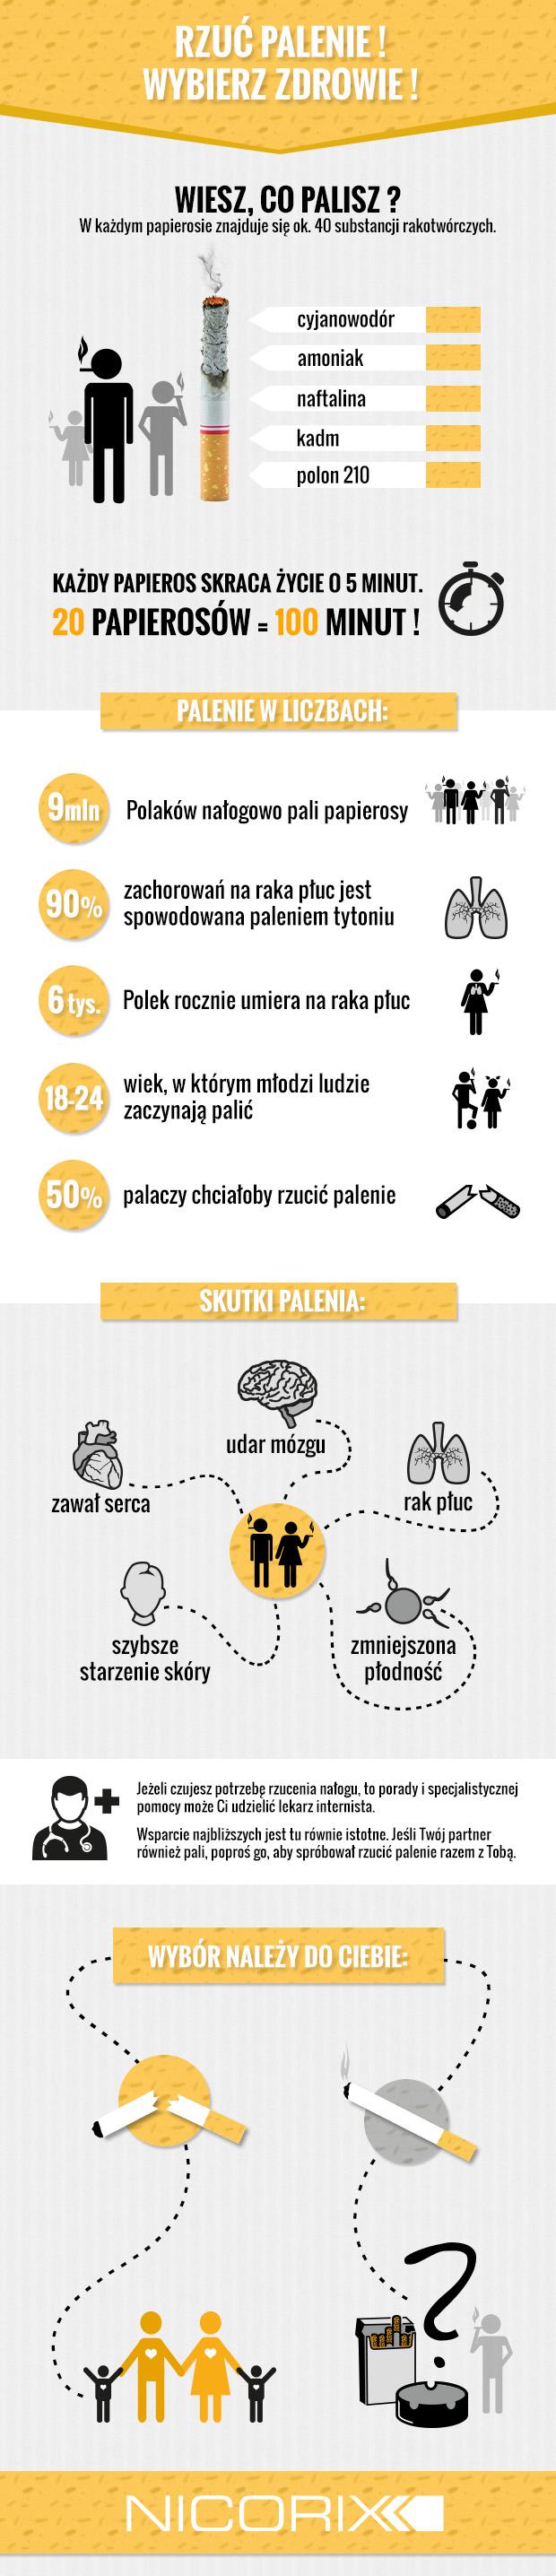 Nicorix infografika